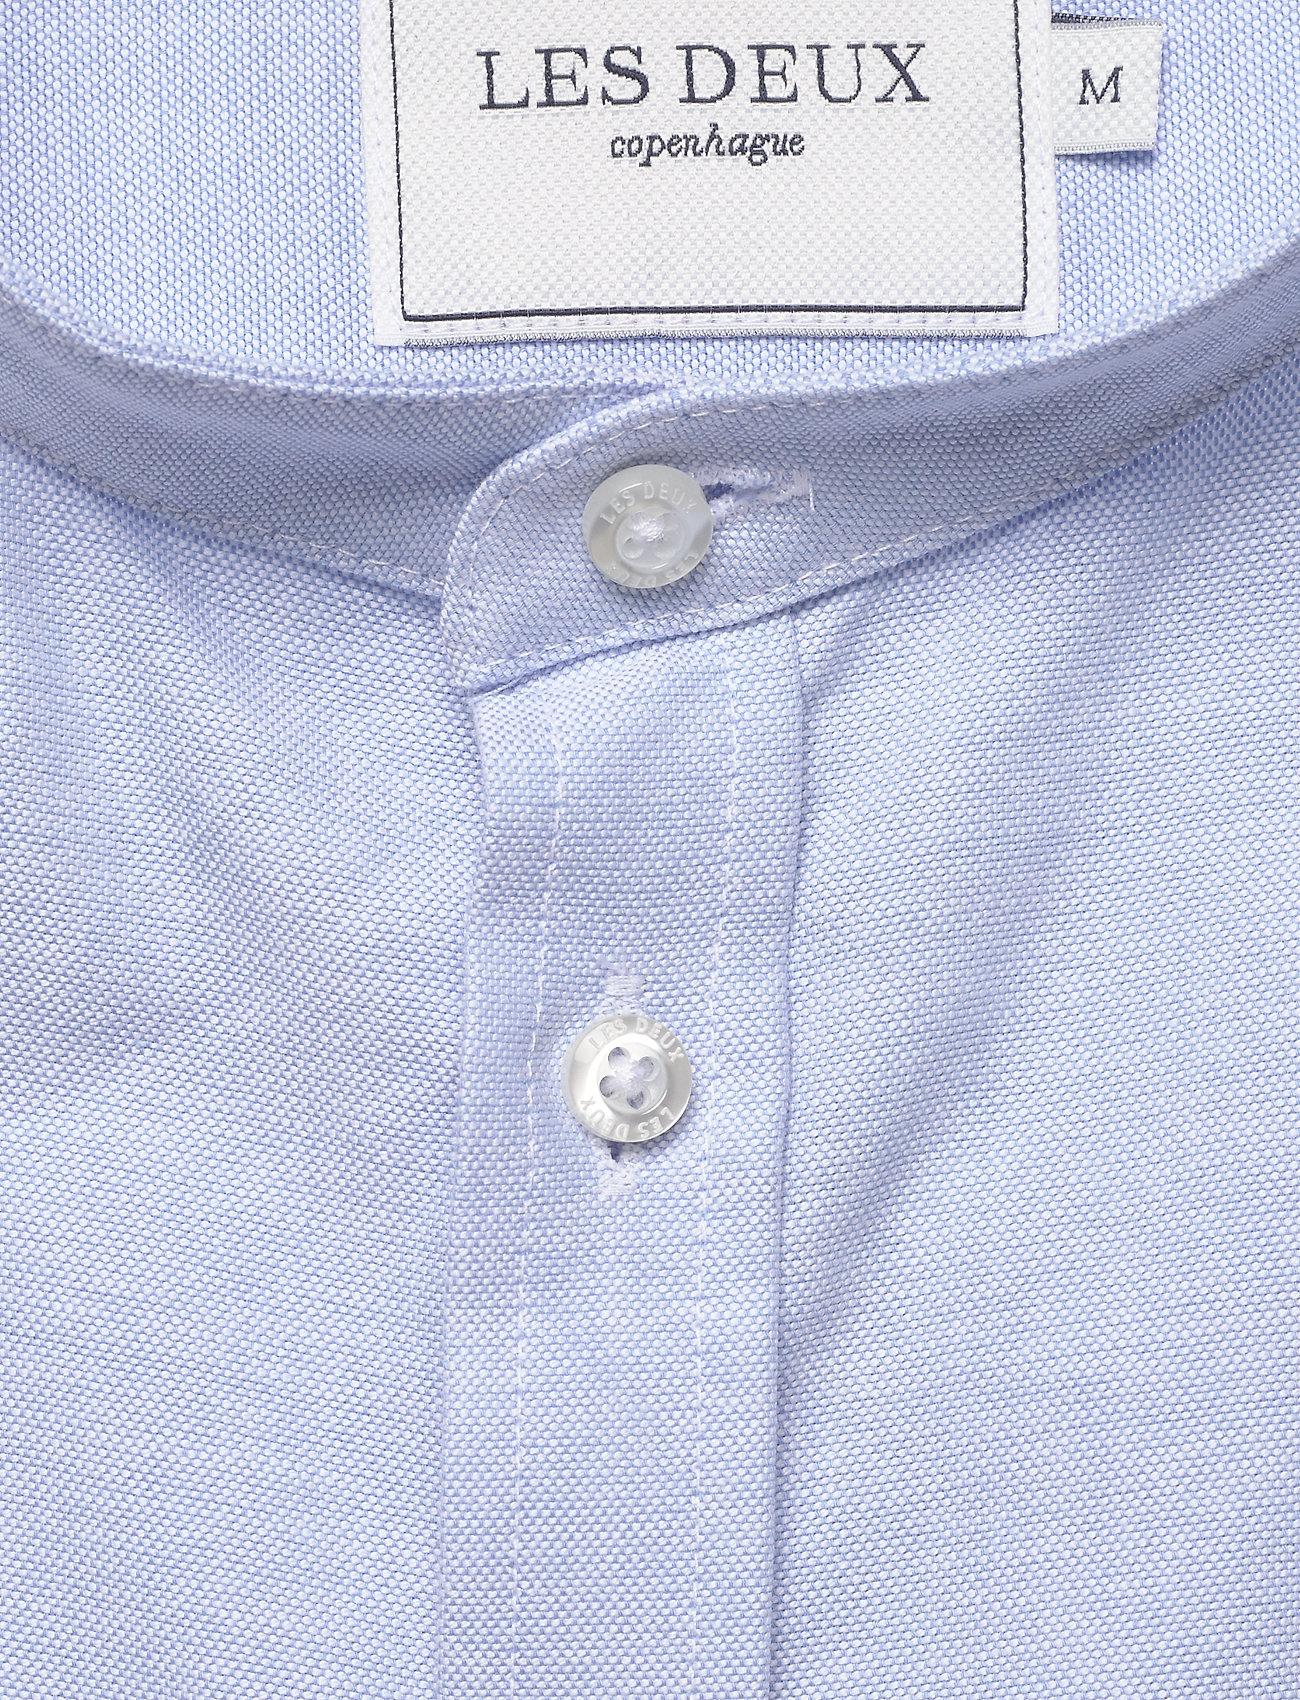 Les Deux Christoph Mandarin Shirt - Skjortor Light Blue